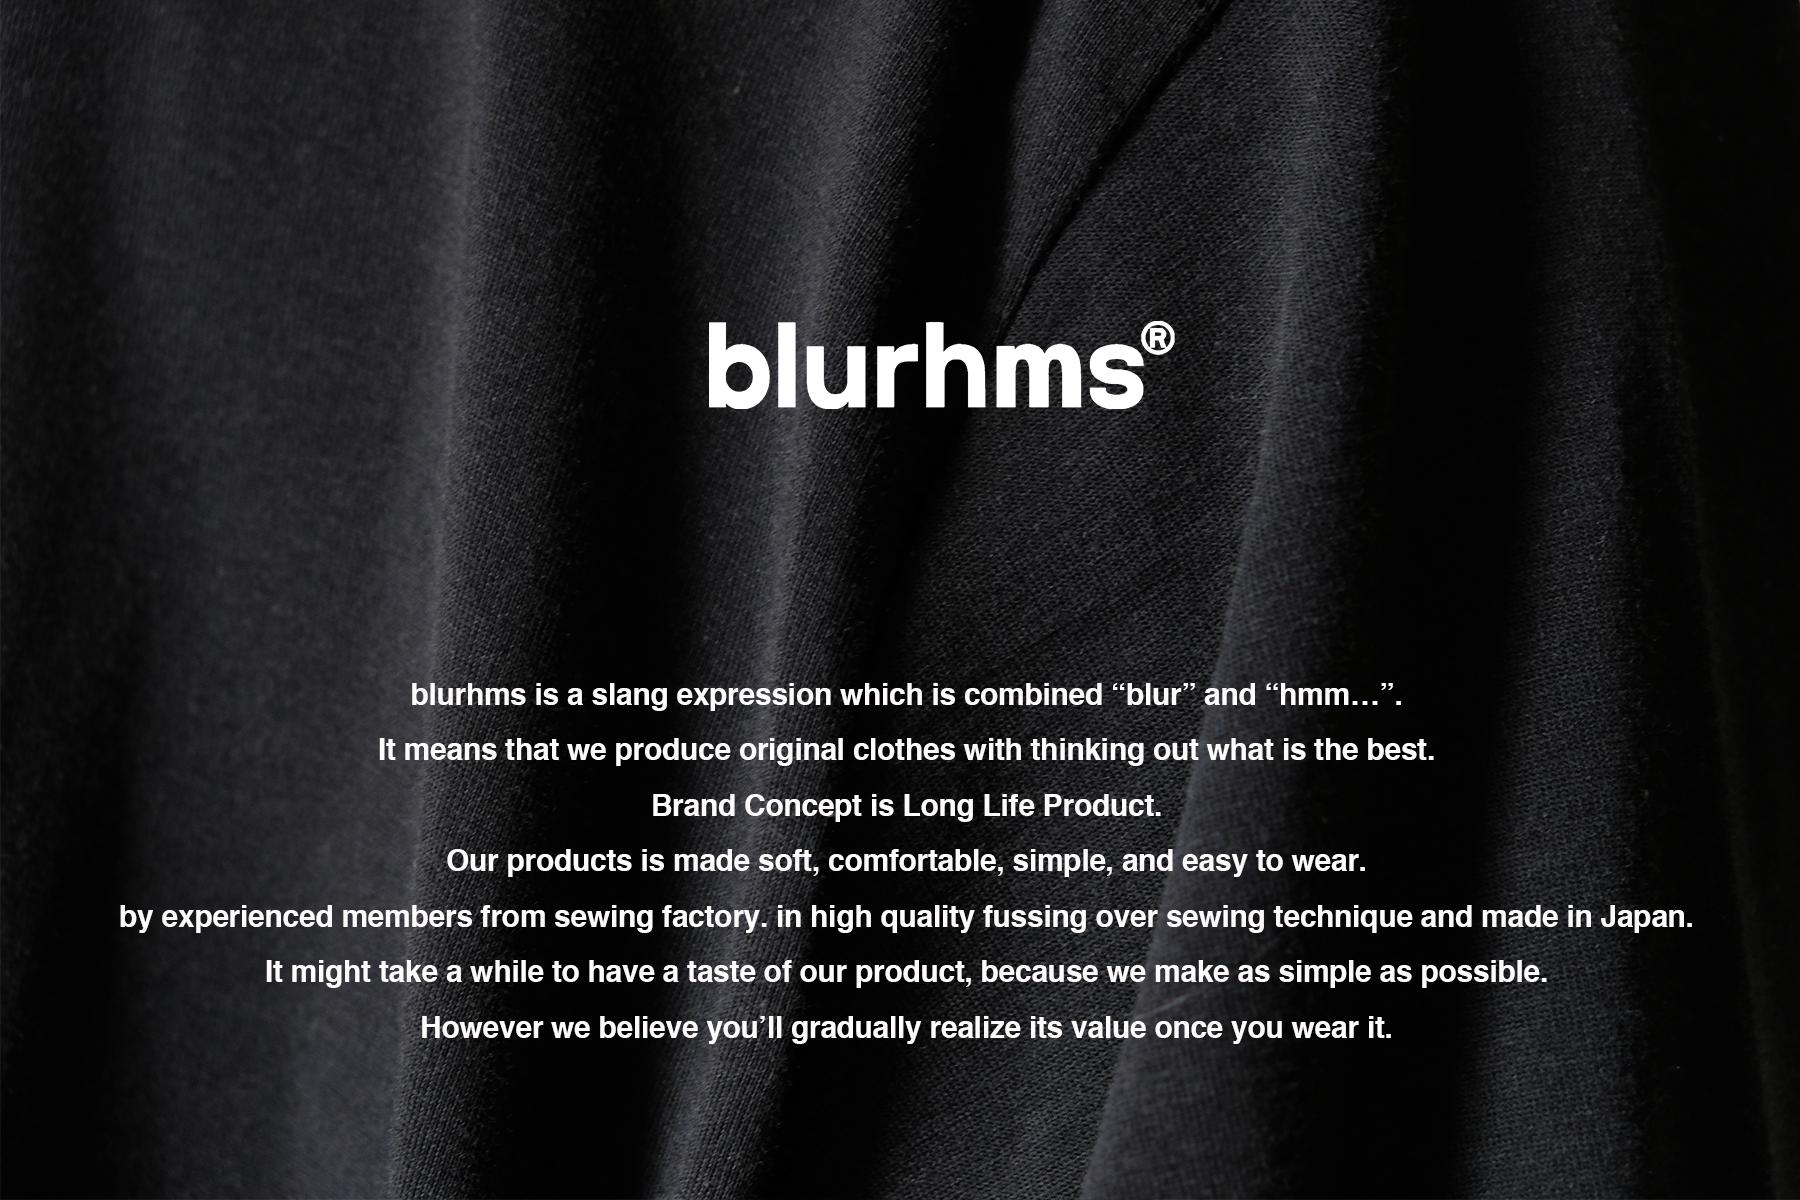 blurhms|ブラームス 2020 AW 1st drop